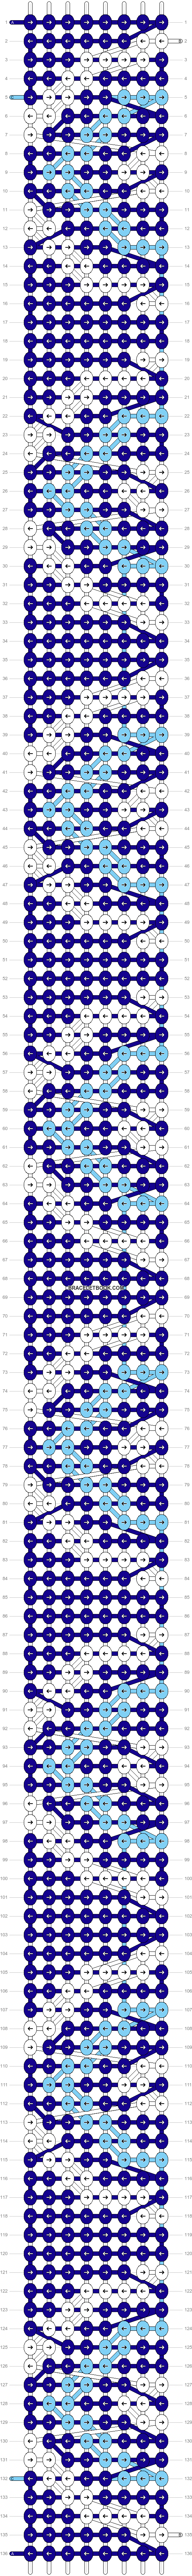 Alpha pattern #99168 pattern